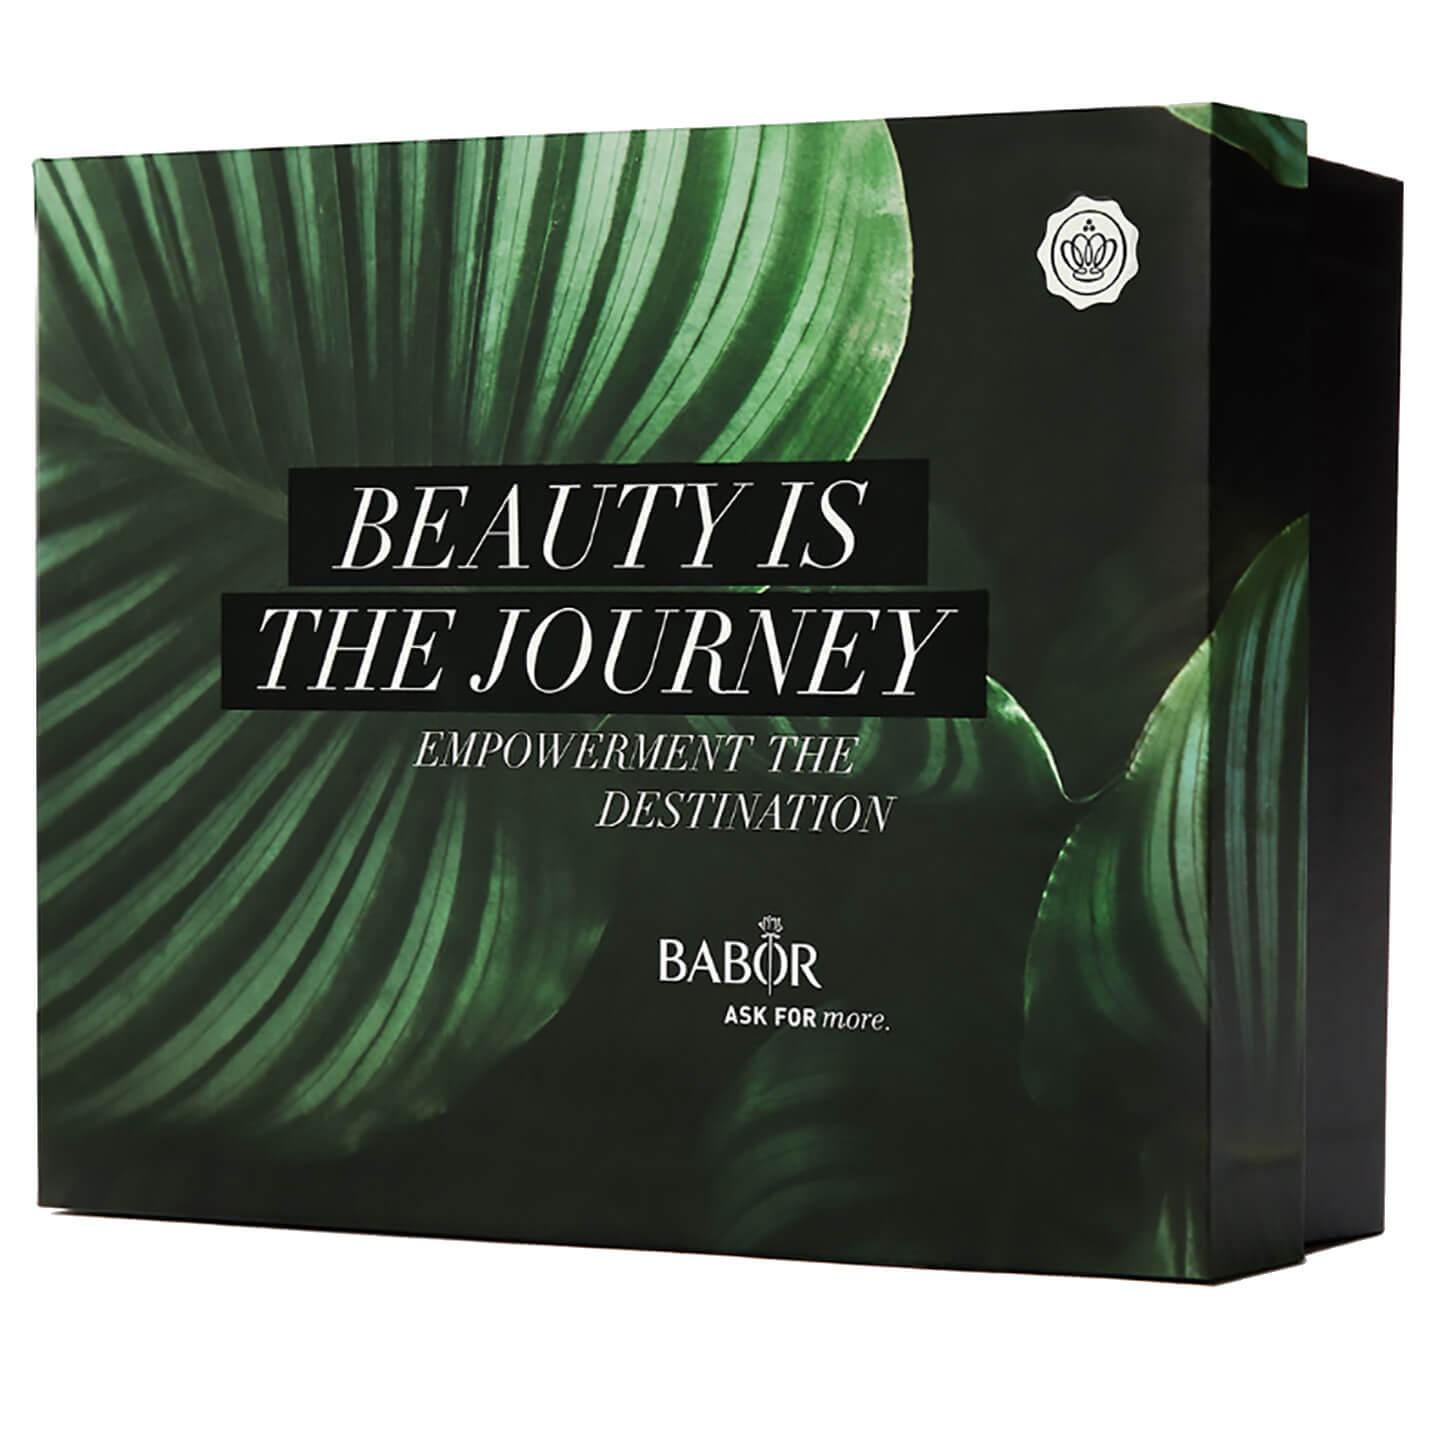 Babor beauty Box für 2,45€ + 2,99€ Versand